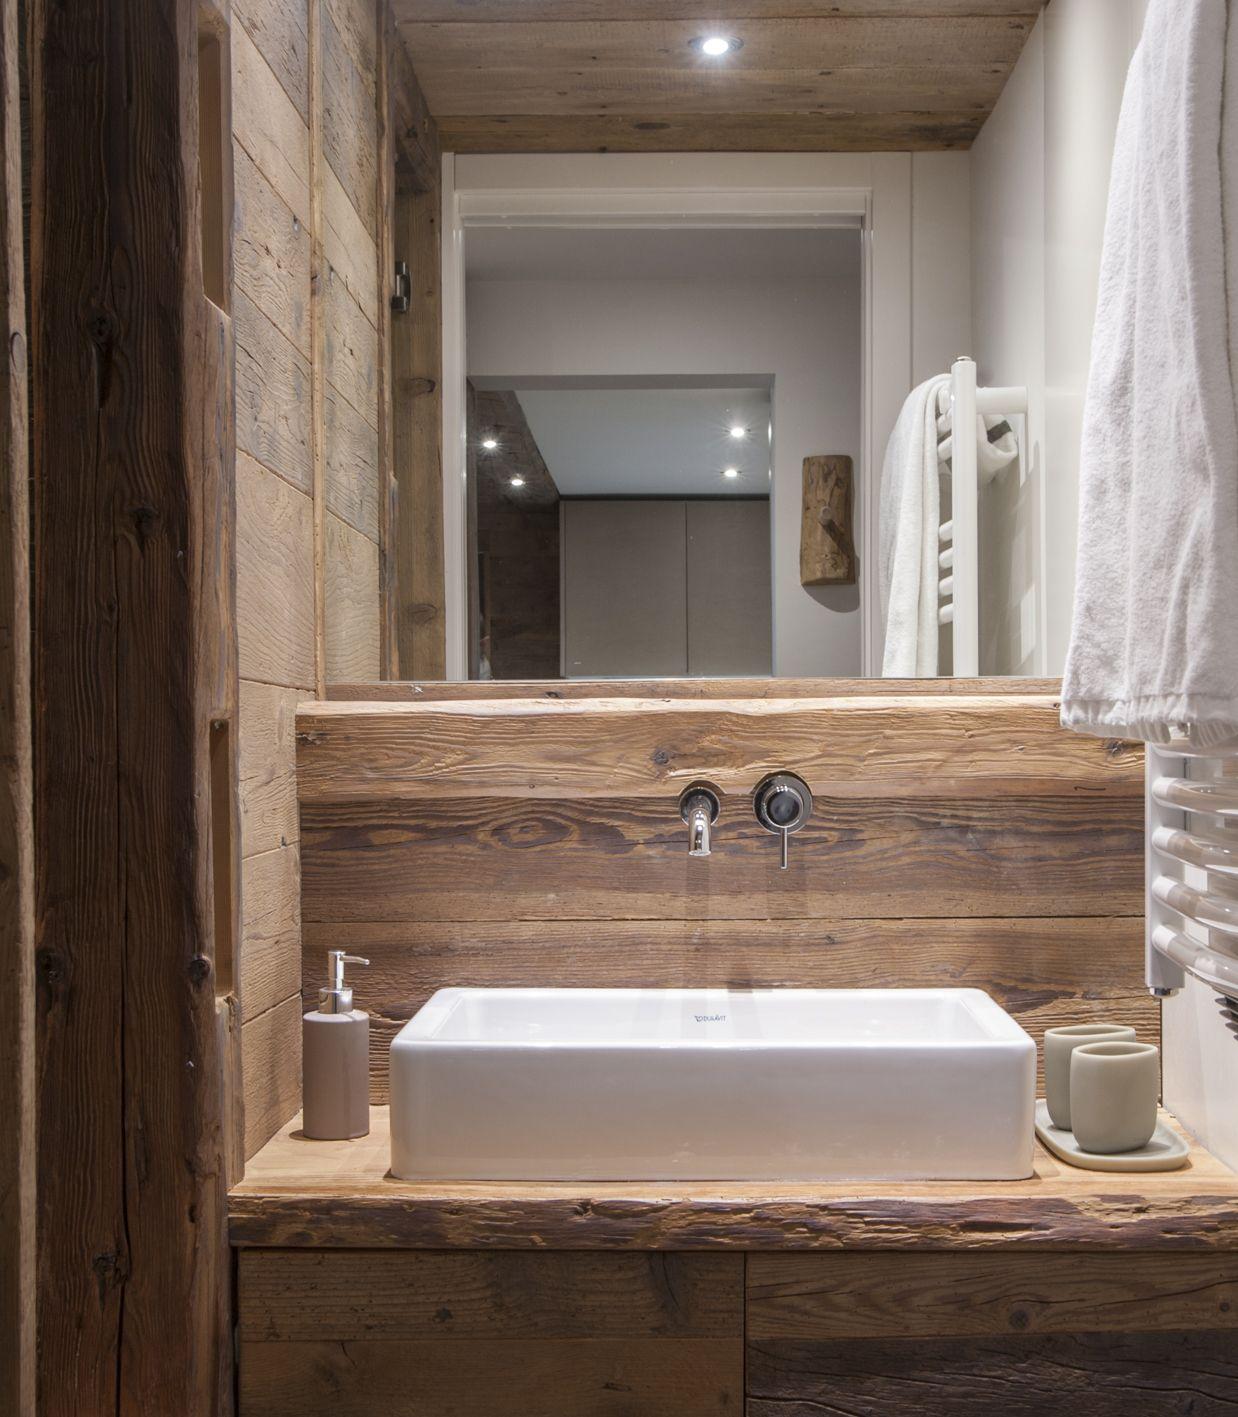 Salle De Bain Chalet chalet in megeve, bathroom interior design | salles de bains